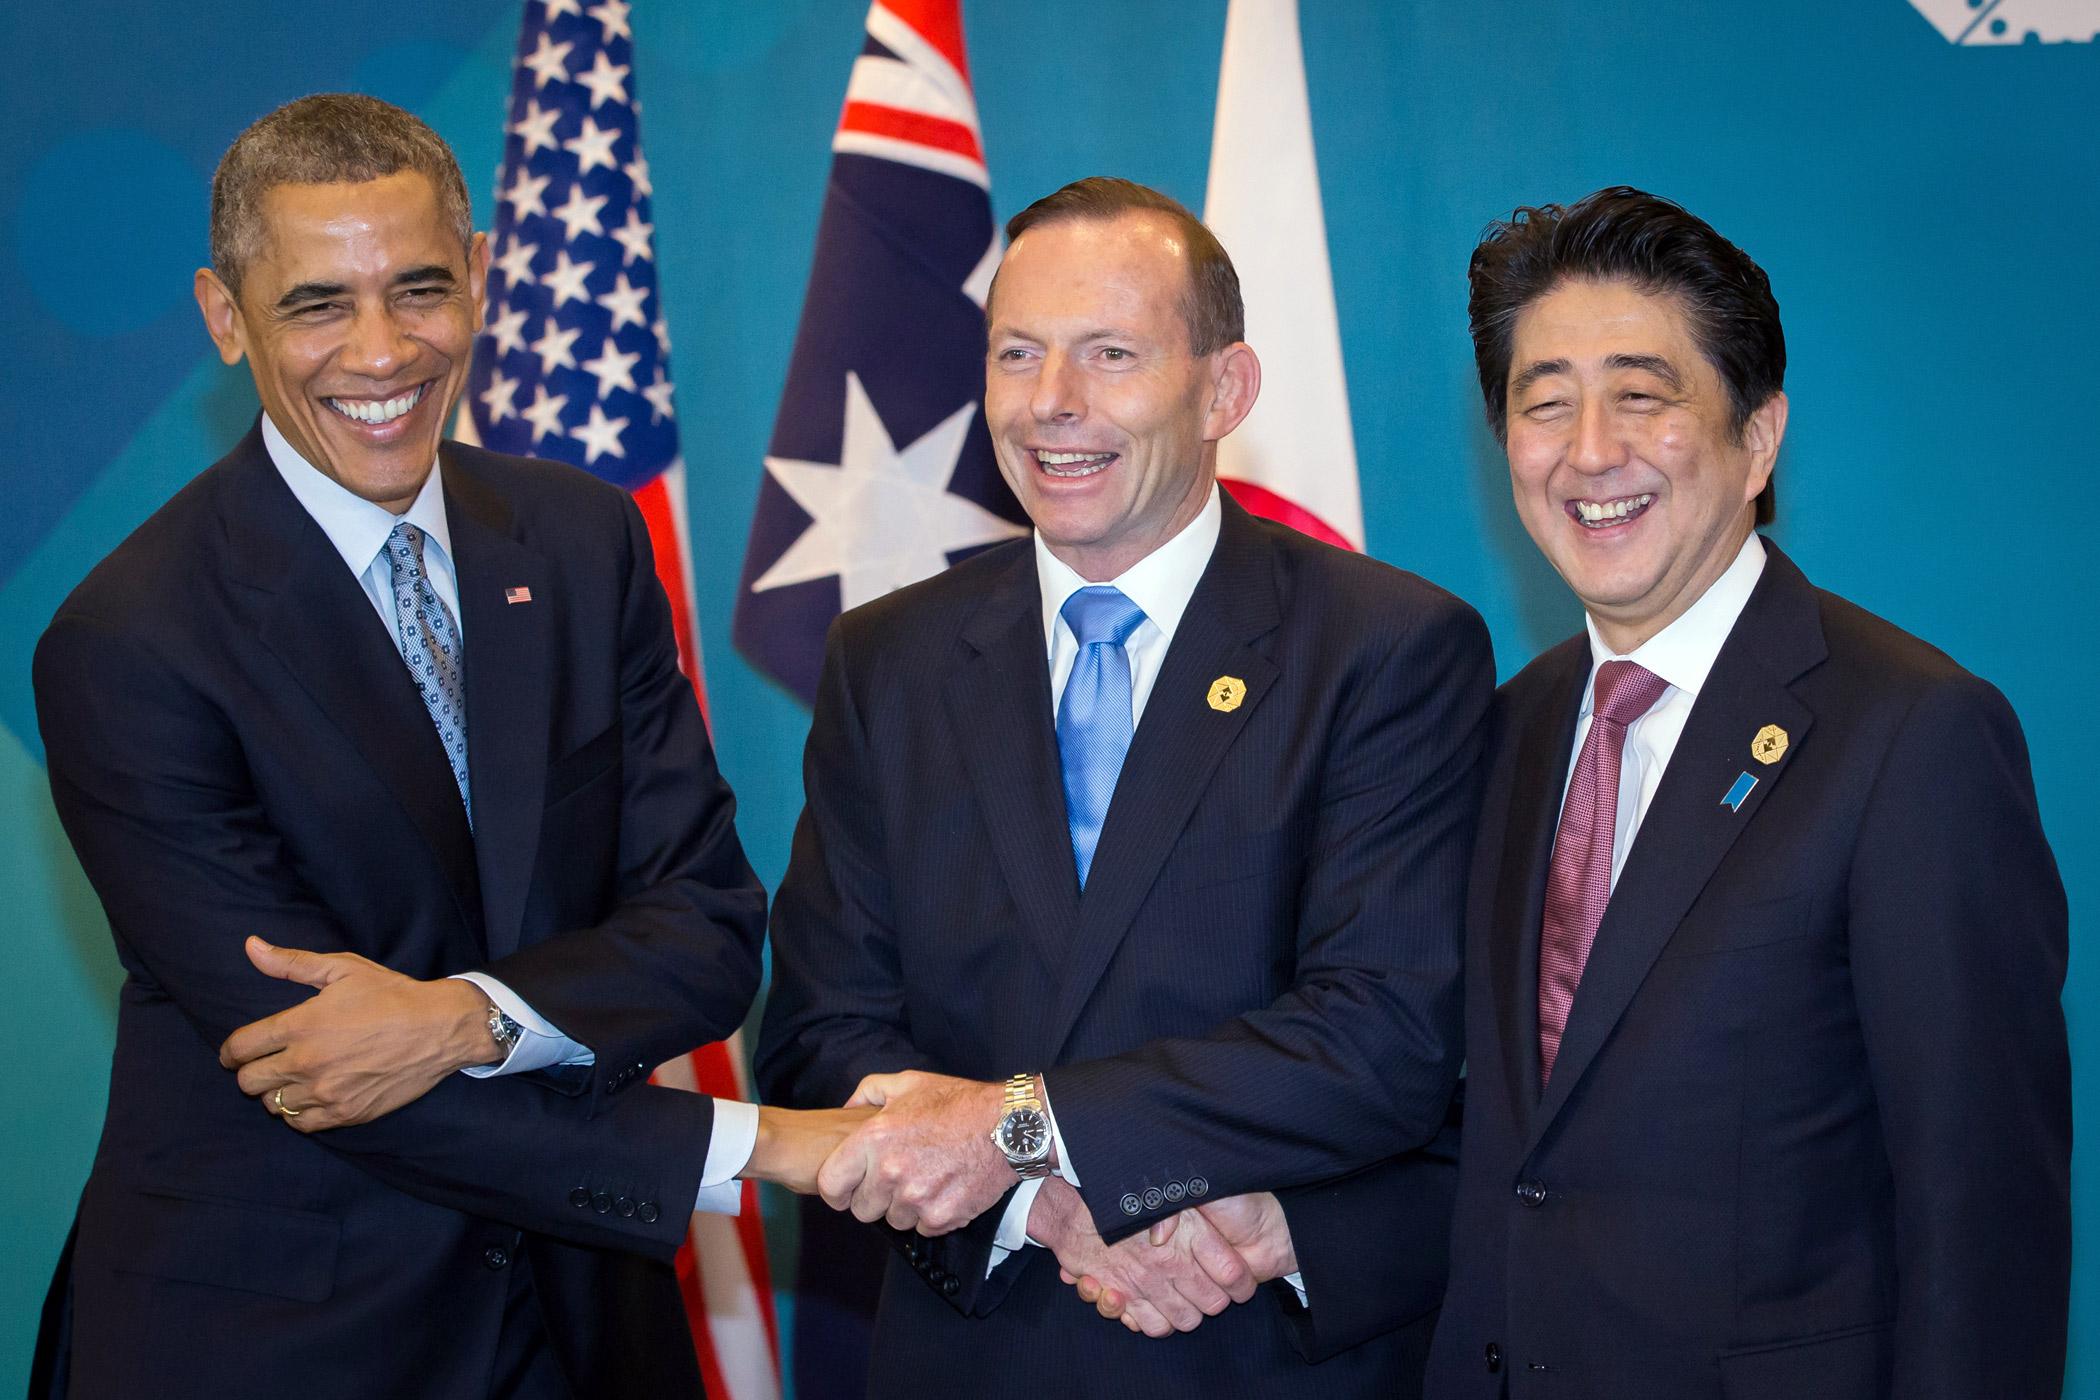 U.S. President Barack Obama, from left, Australian Prime Minister Tony Abbott and Japanese Prime Minister Shinzo Abe share a three-way handshake at the G-20 Summit in Brisbane, Australia on Nov. 16, 2014.